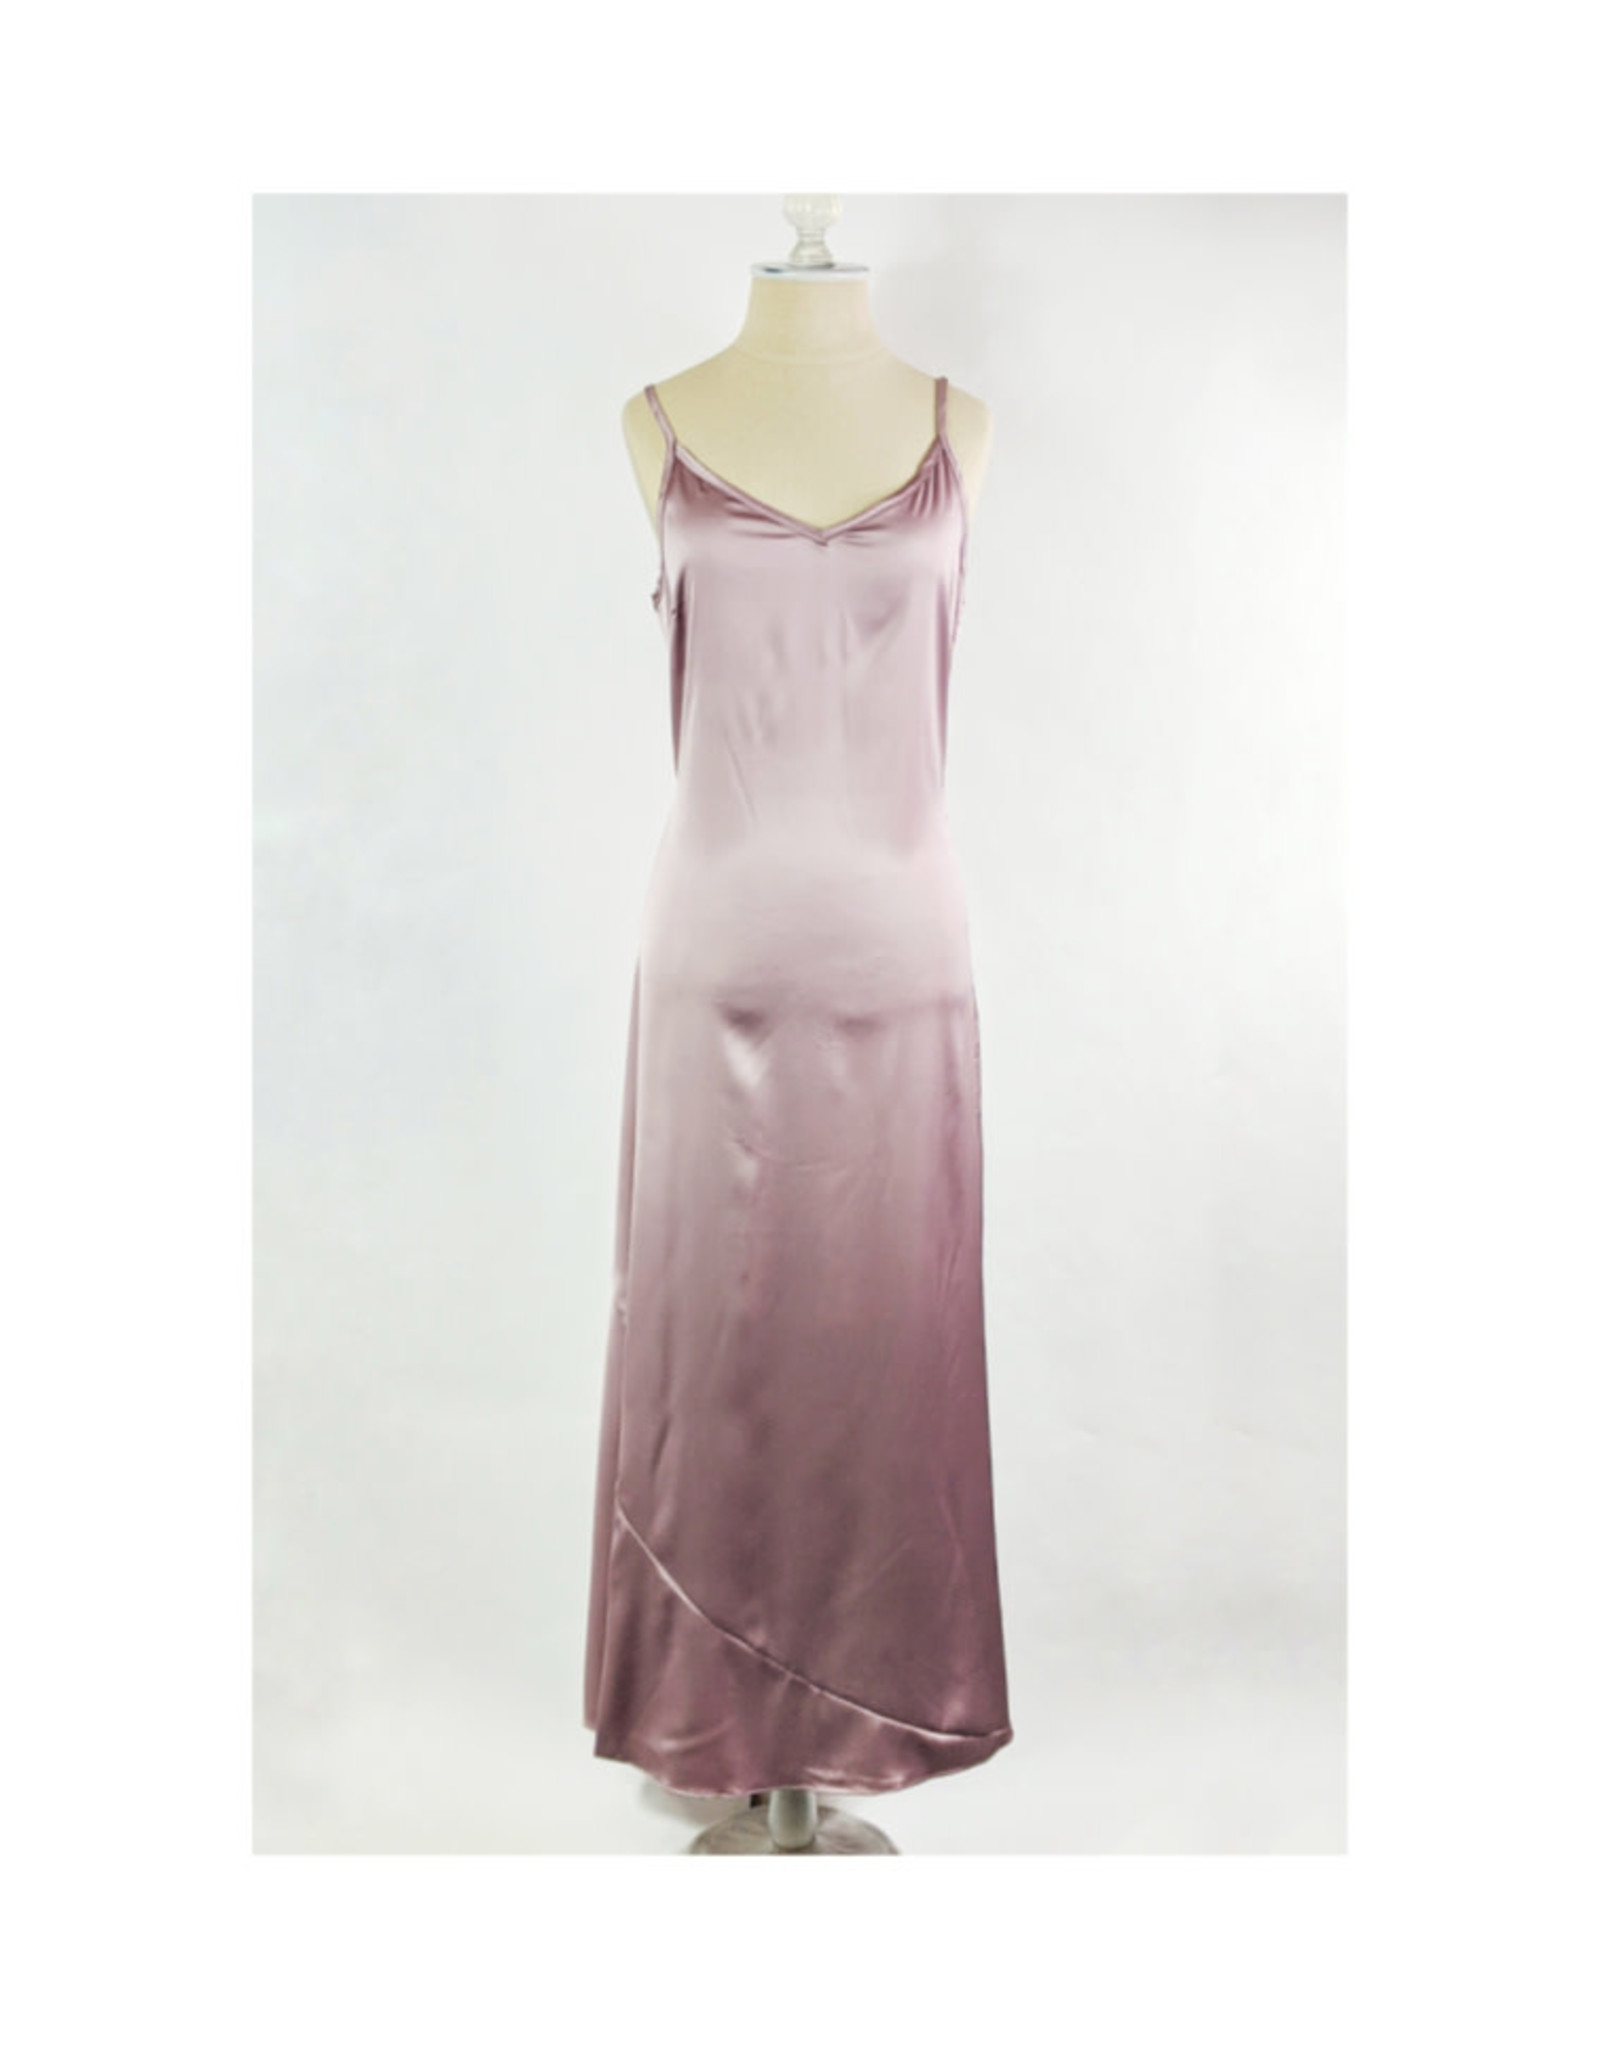 Sugarlips Champagne Satin Slip Dress